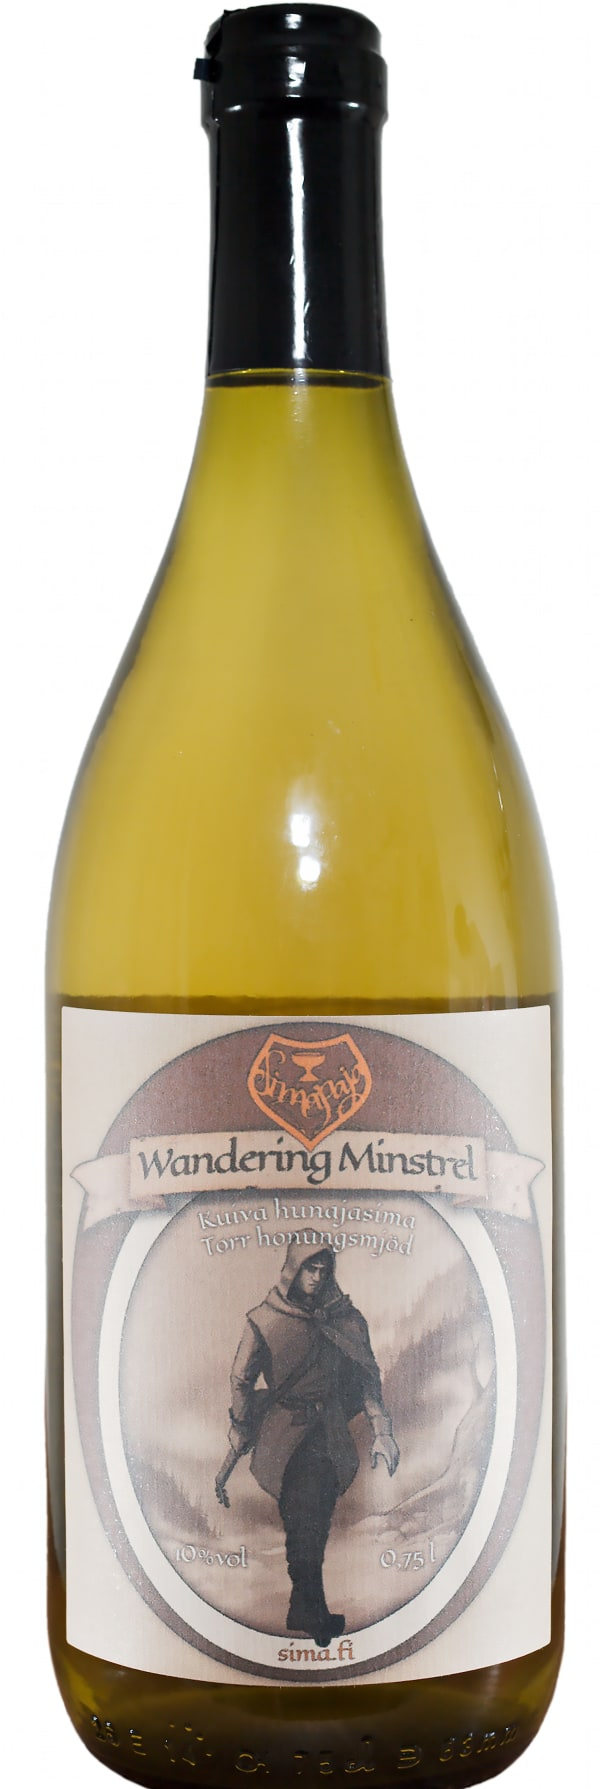 Simapaja Wandering Minstrel kuiva hunajasima